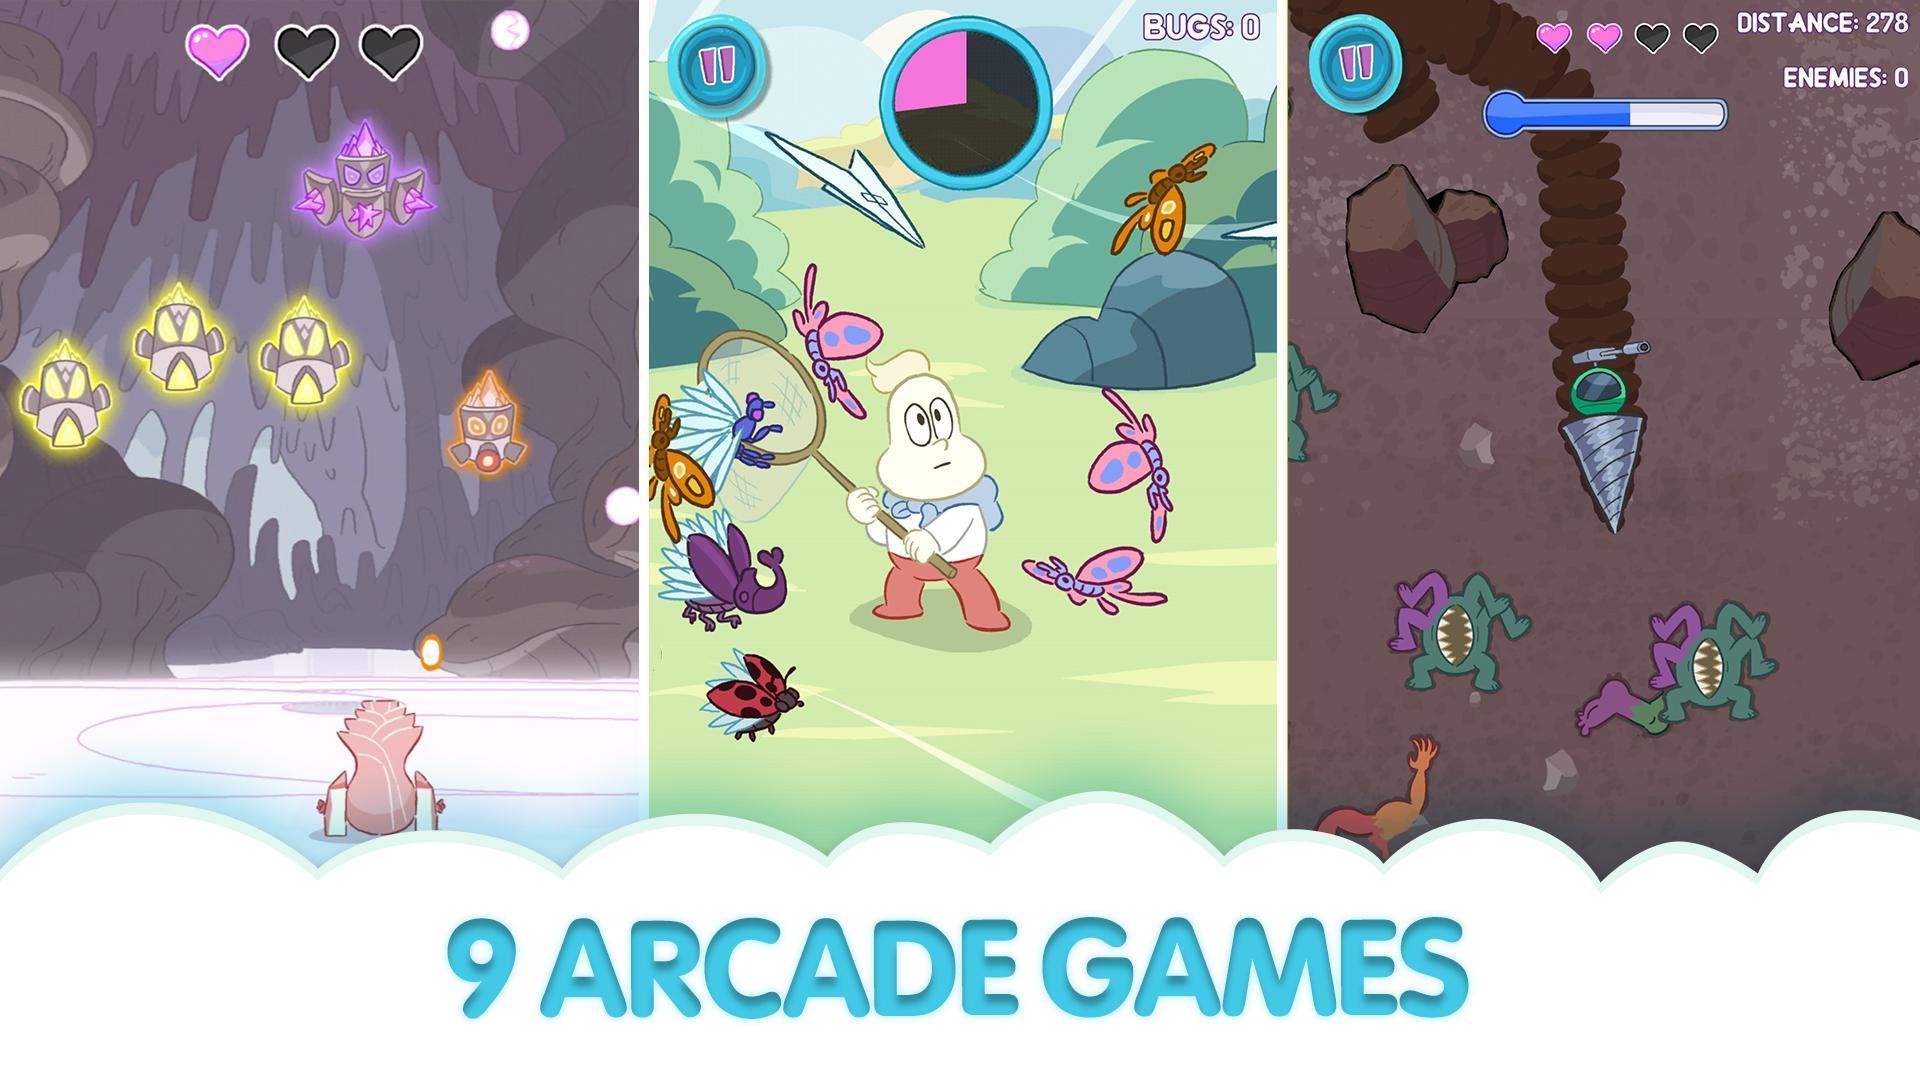 Dreamland solitaire dragons fury free download game | adnan boy.